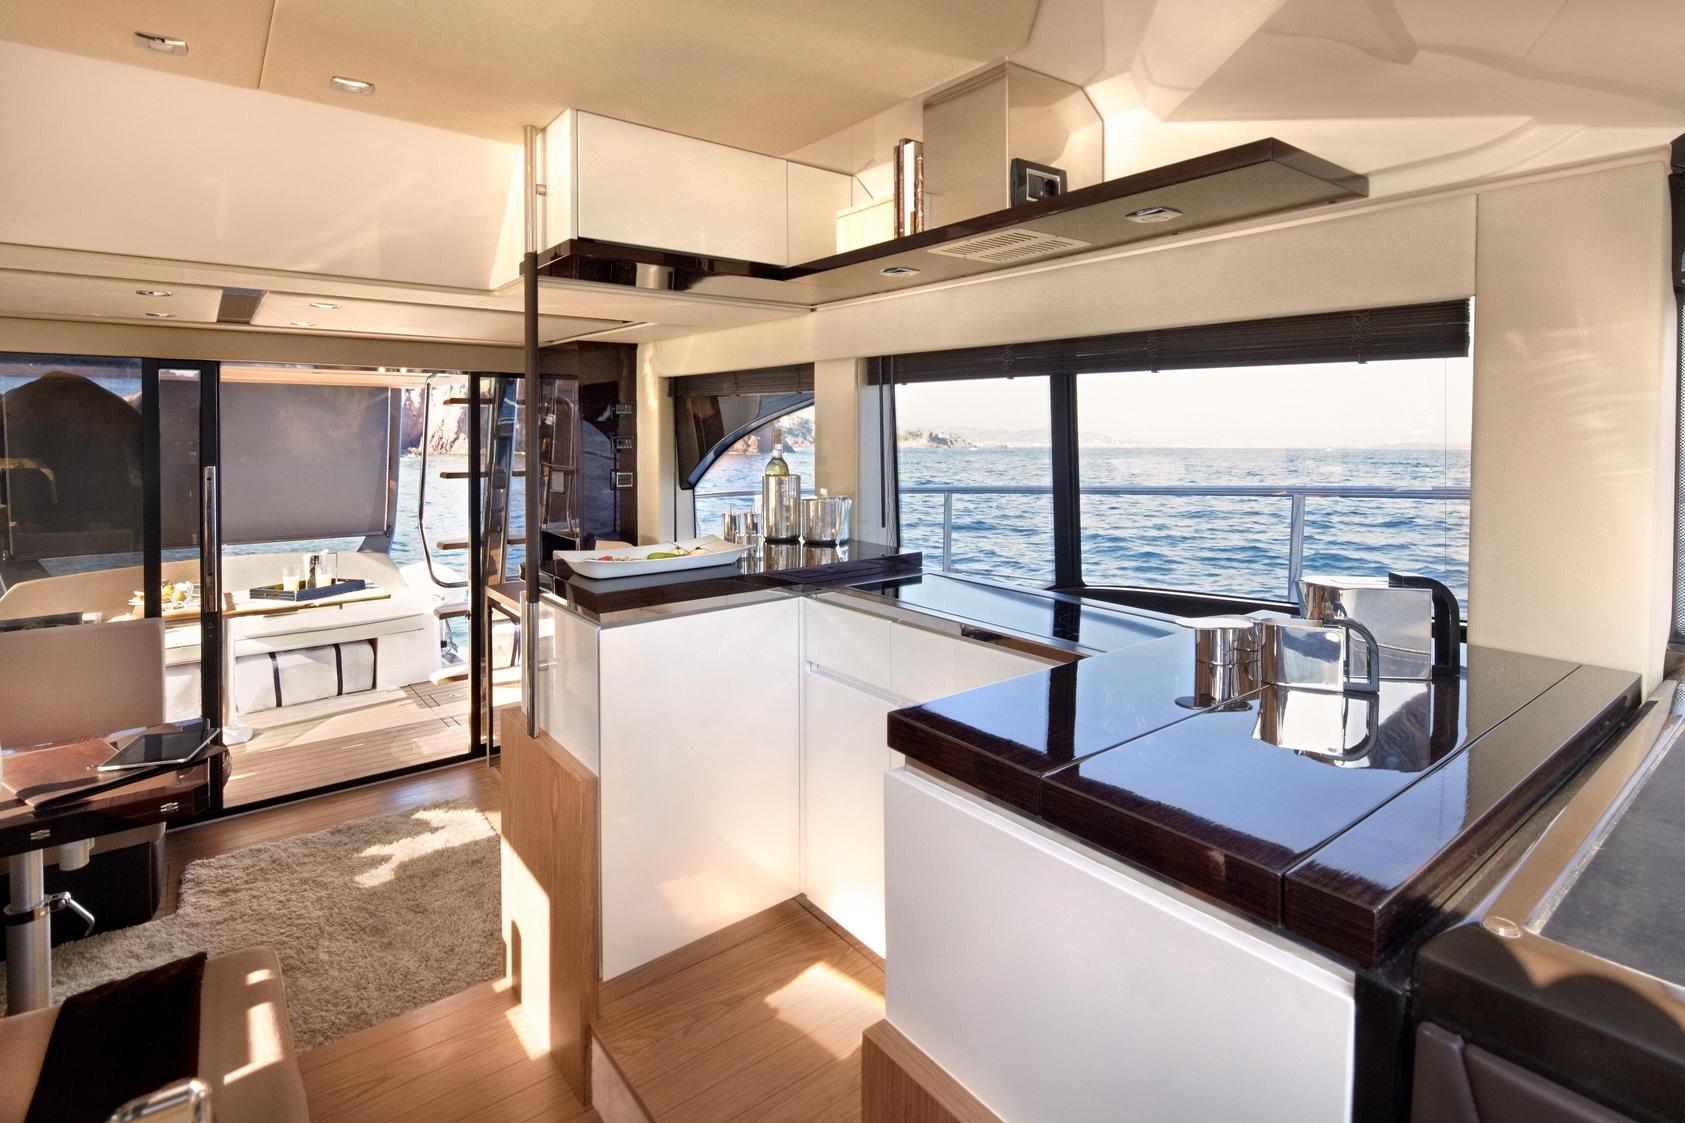 Incroyable Motor Yacht FLY 45 By Sessa Marine U2013 Interior